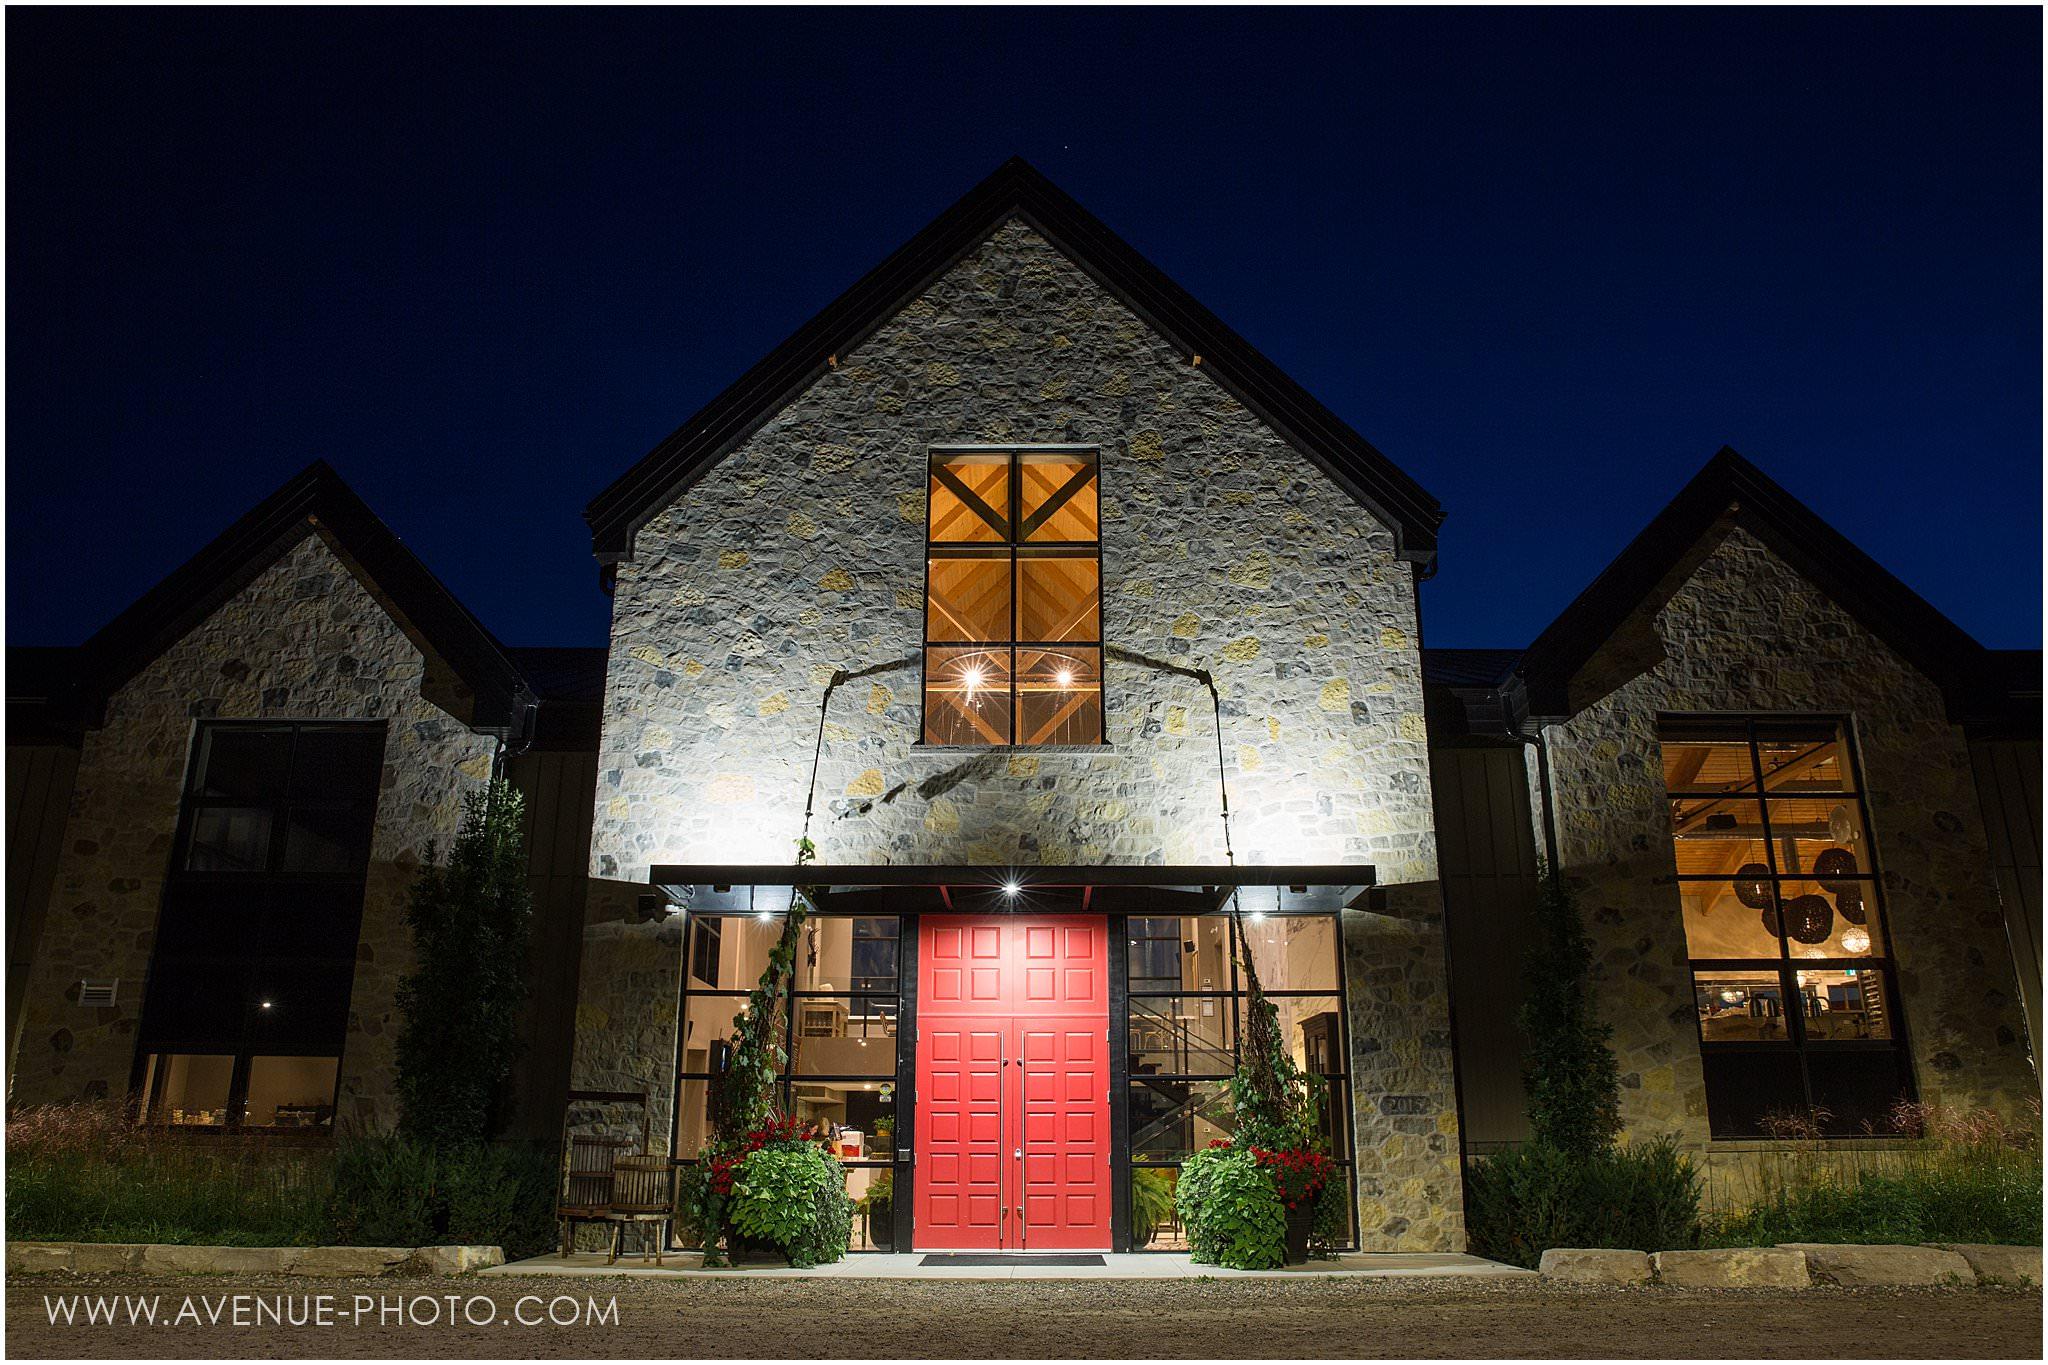 Adamo Estate Winery Wedding Photos, Hockley Valley Wedding Photos, Orangeville Wedding Photos, Vineyard Wedding, Avenue Photo, Exterior at Night